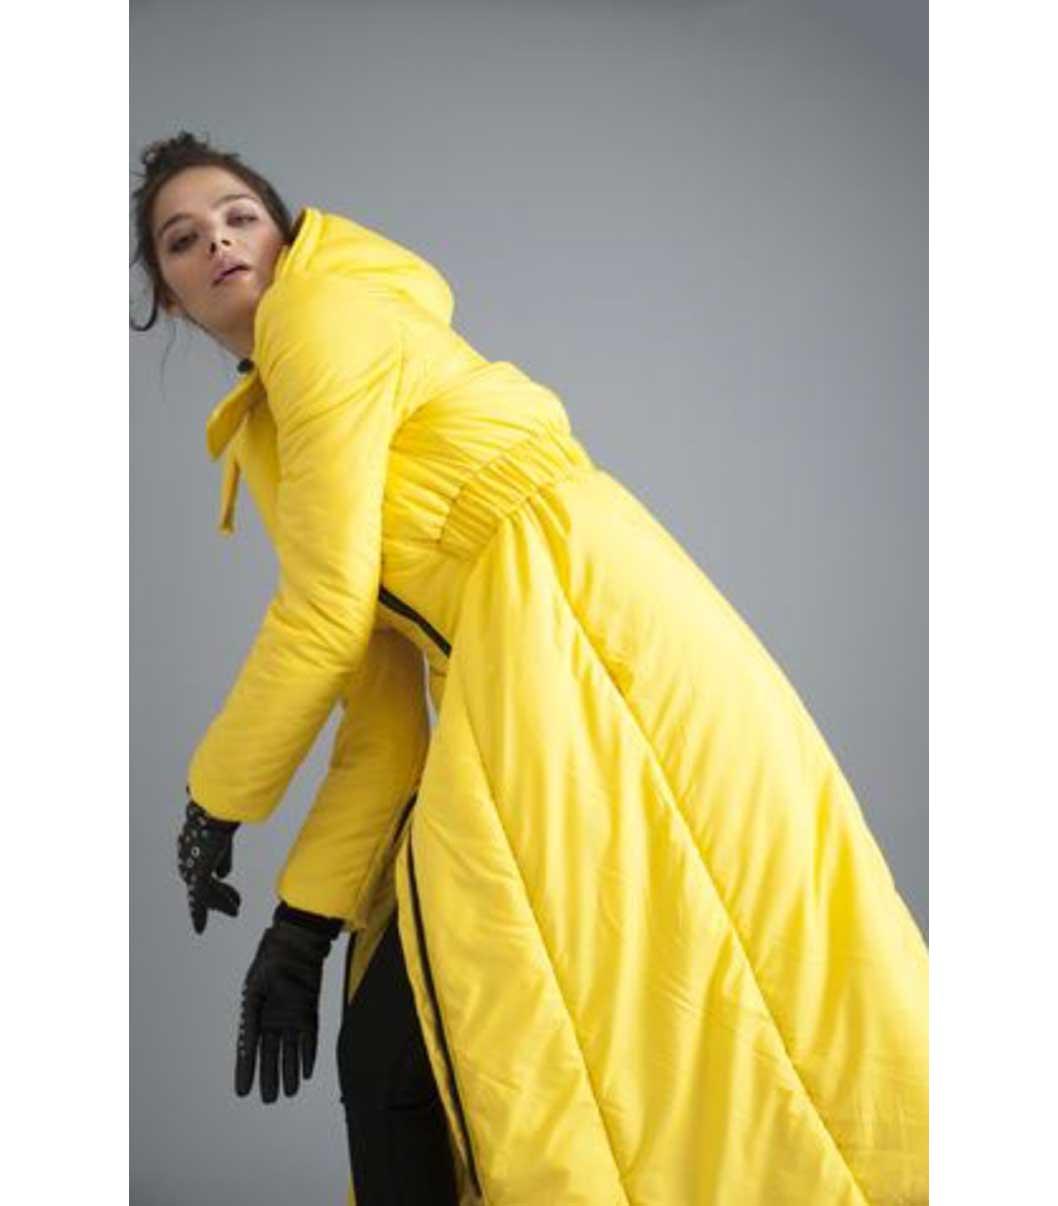 Vaute Couture Vegan Sustainable Outerwear New York Ecolookbook